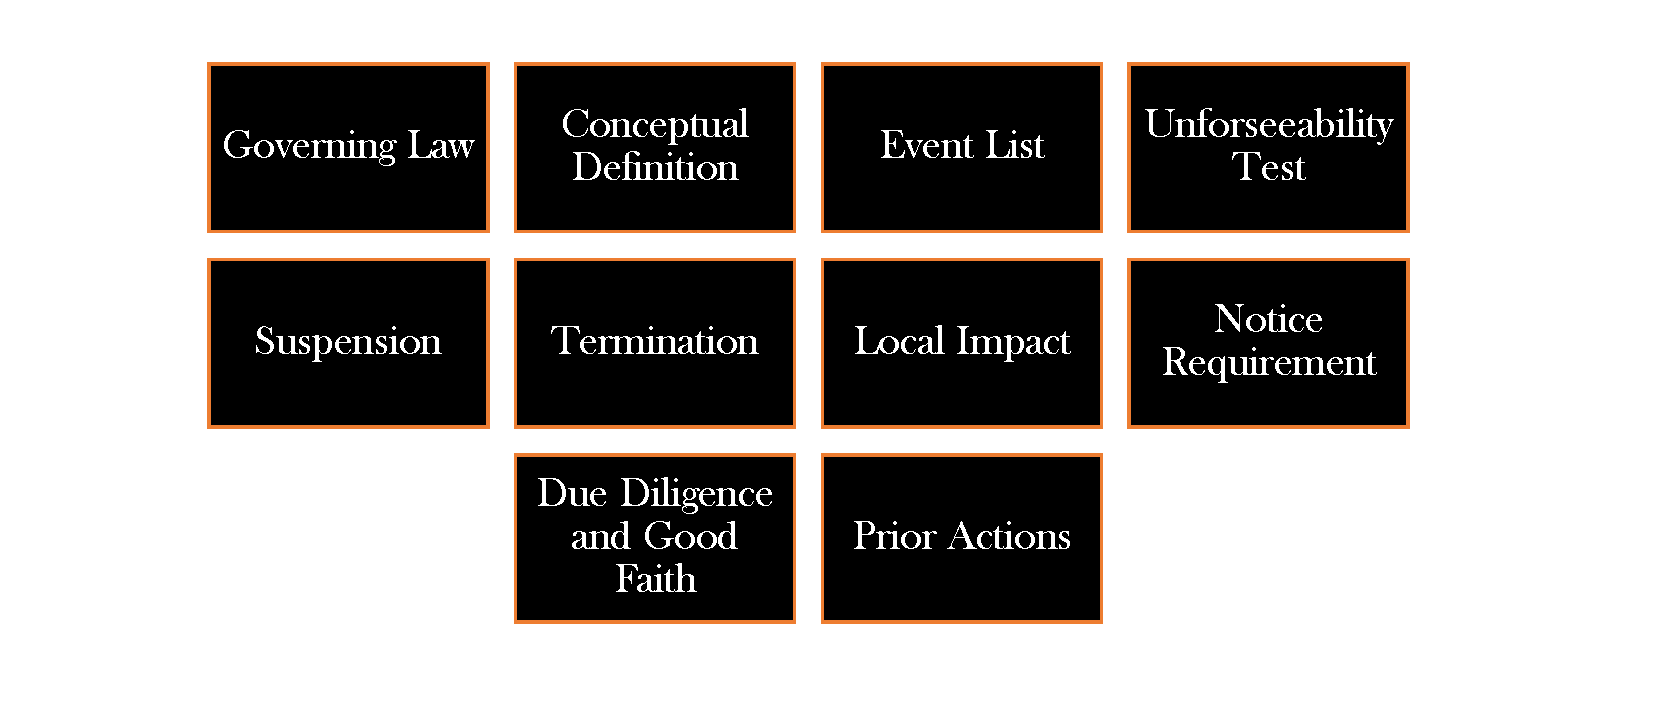 10 considerations